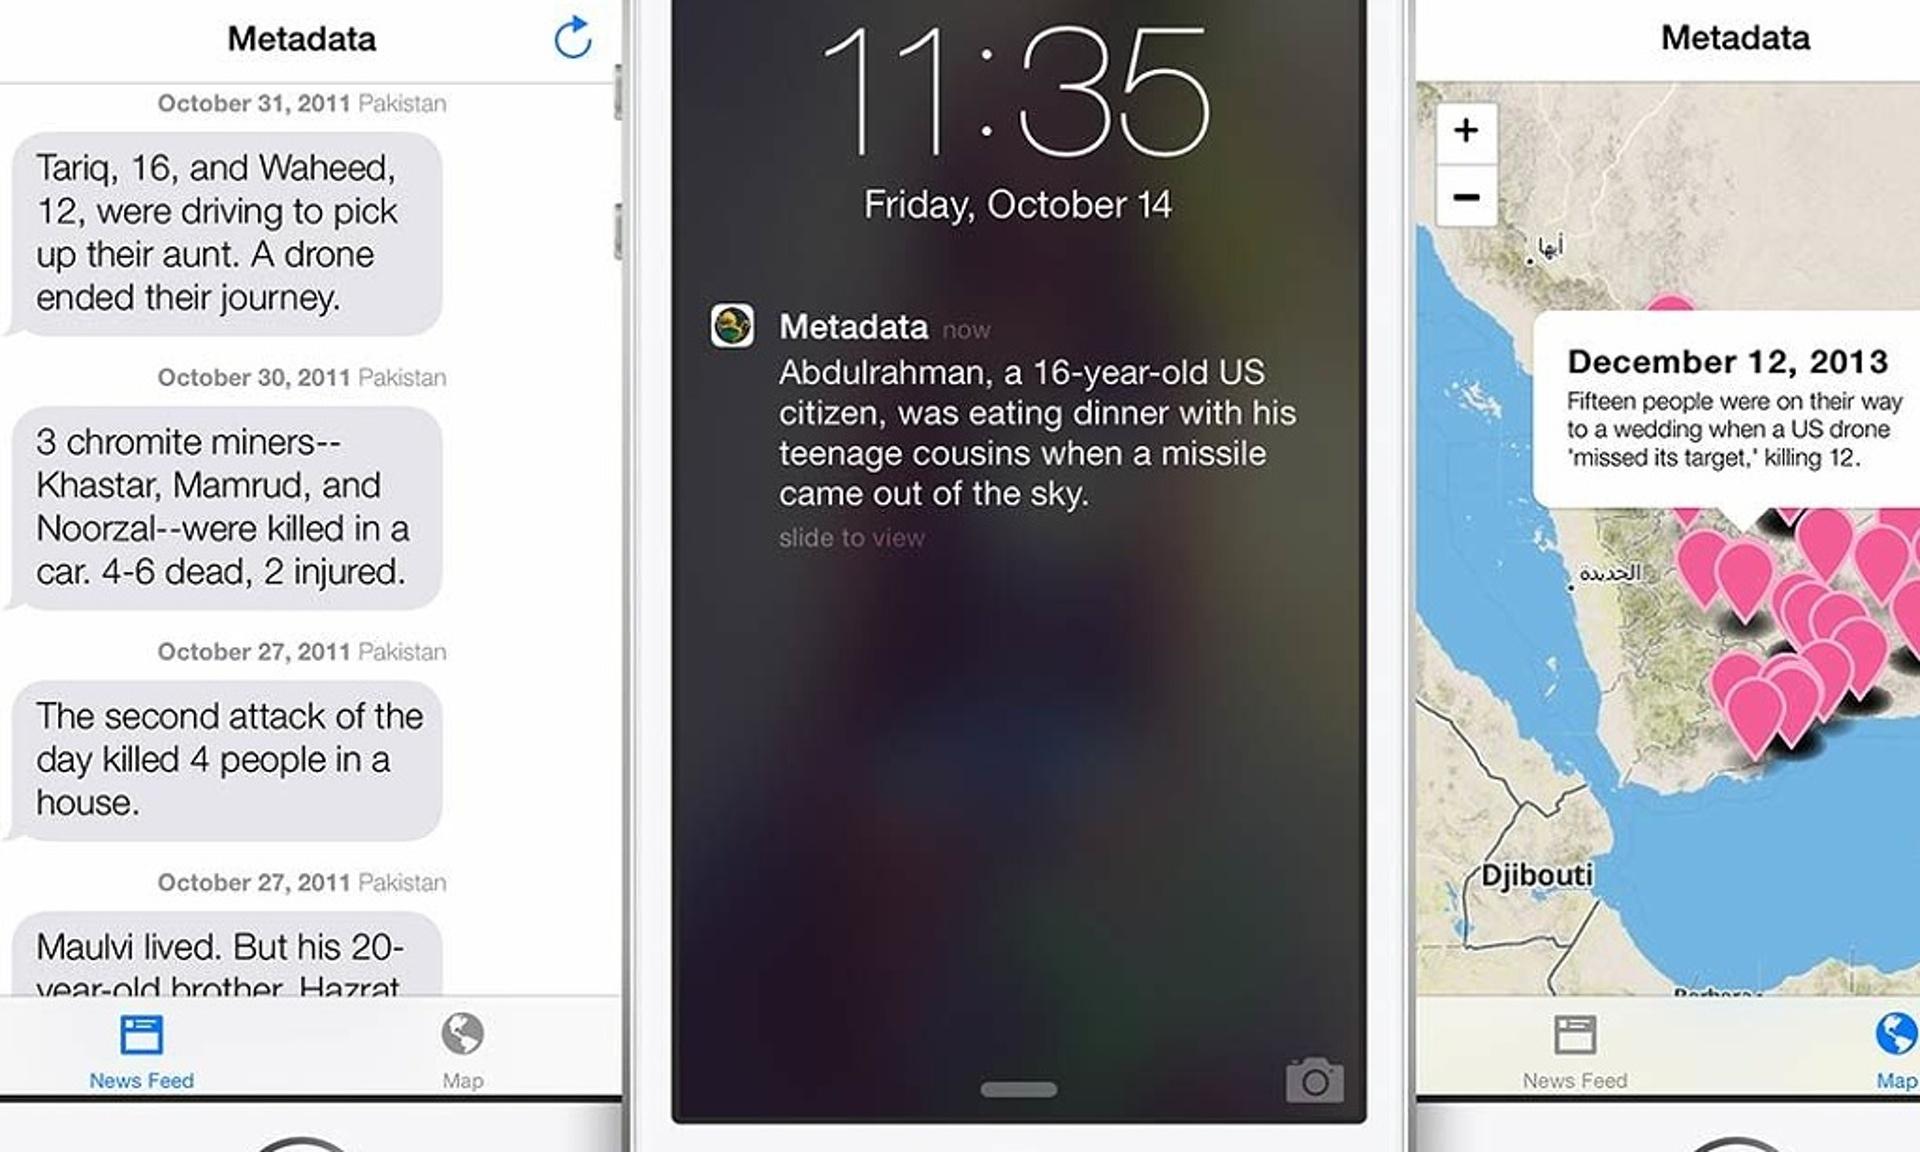 Metadata+ app removal